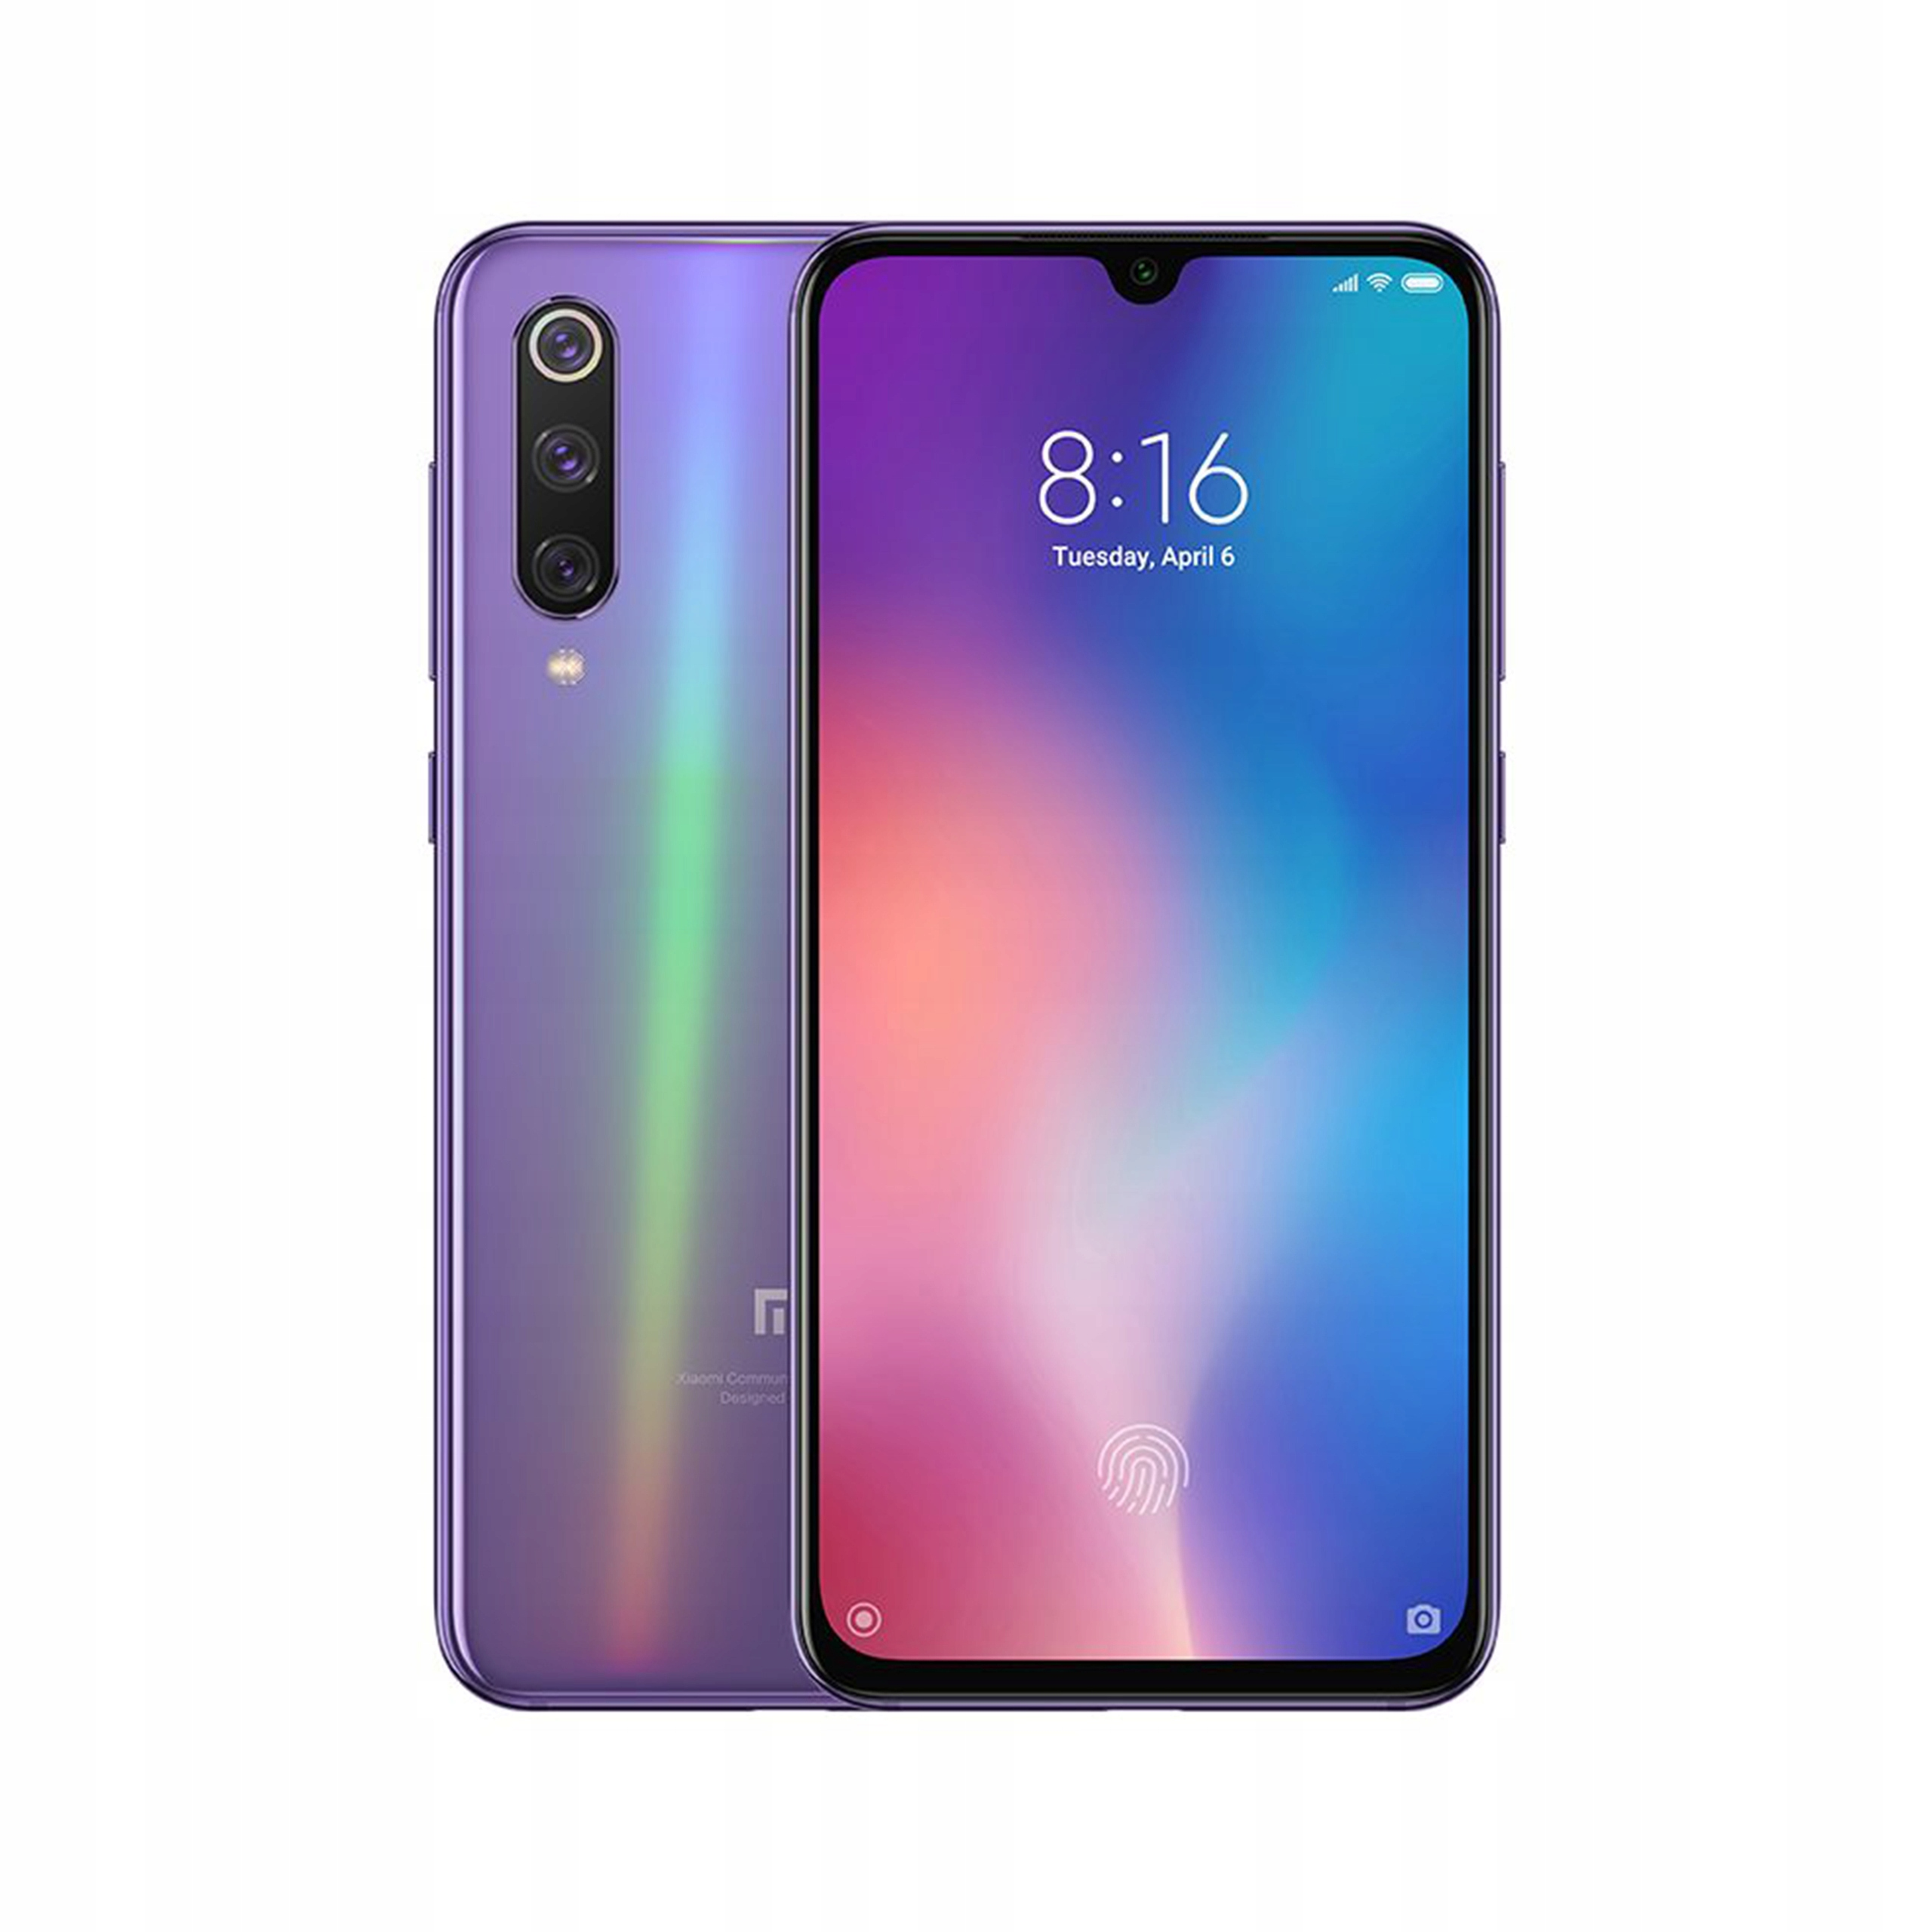 Xiaomi Mi 9 SE Dual - 128GB, 6GB RAM - Global Lavender Violet